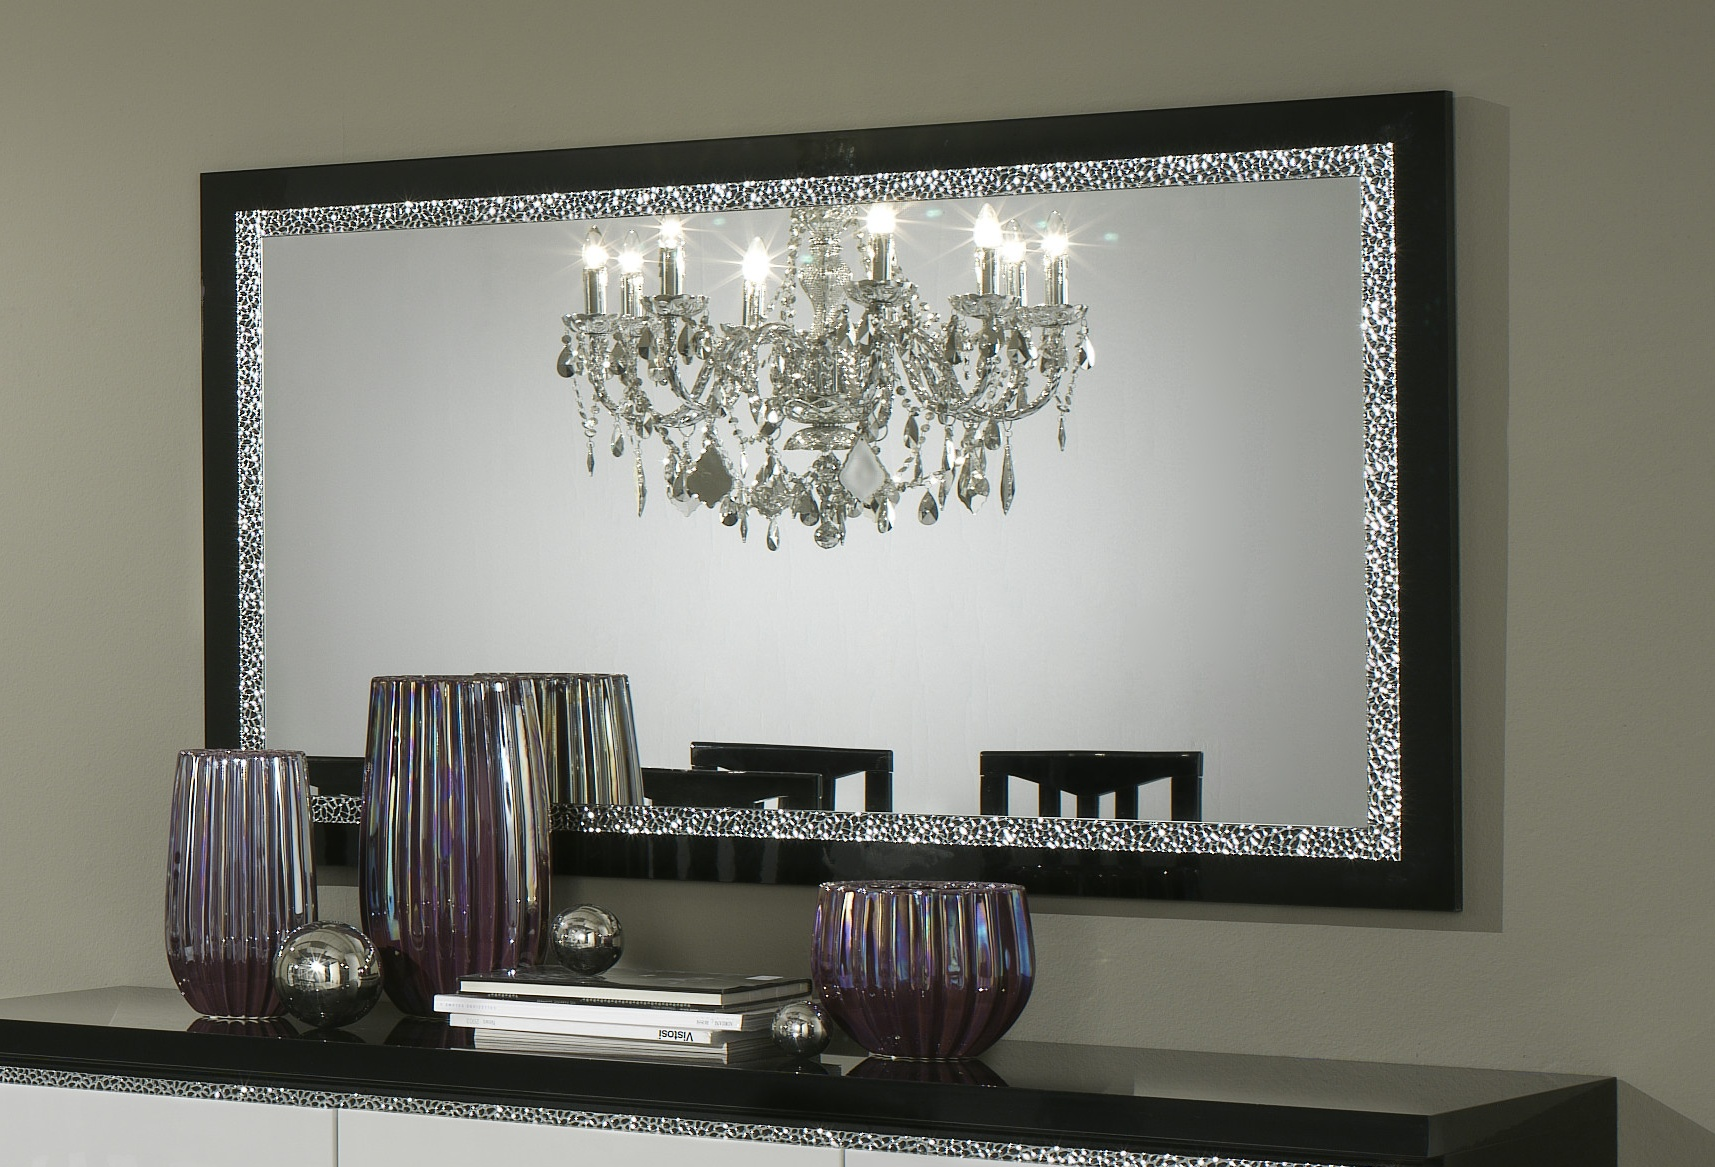 miroir de salle manger design 180 cm laqu noir isabella. Black Bedroom Furniture Sets. Home Design Ideas